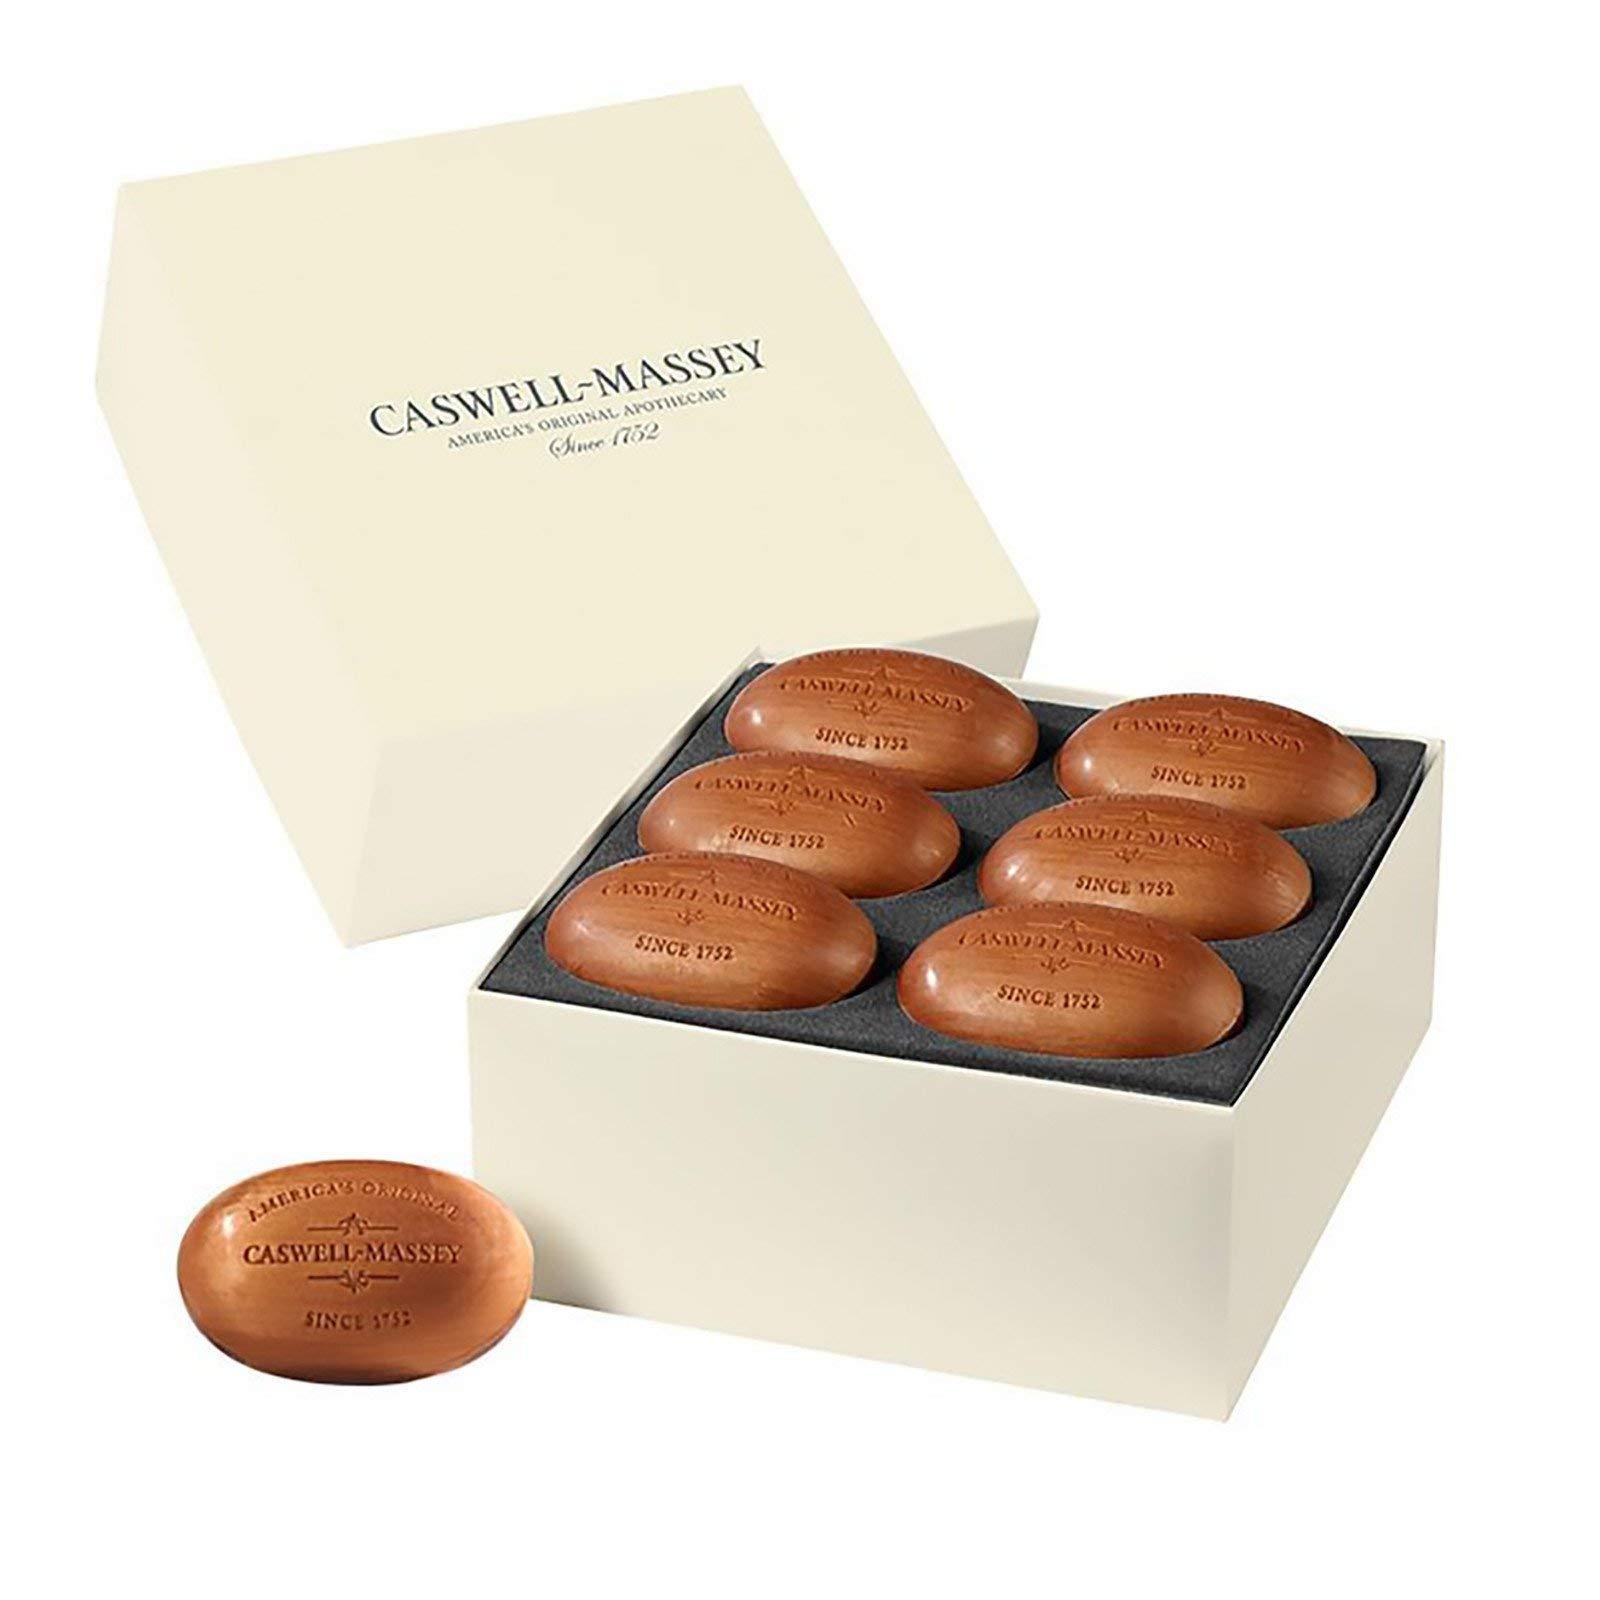 Caswell-Massey Triple Milled Woodgrain Sandalwood Luxury Bath Soap - Year of Soap Boxed Set – 5.8 Ounce Each, 12 Bars